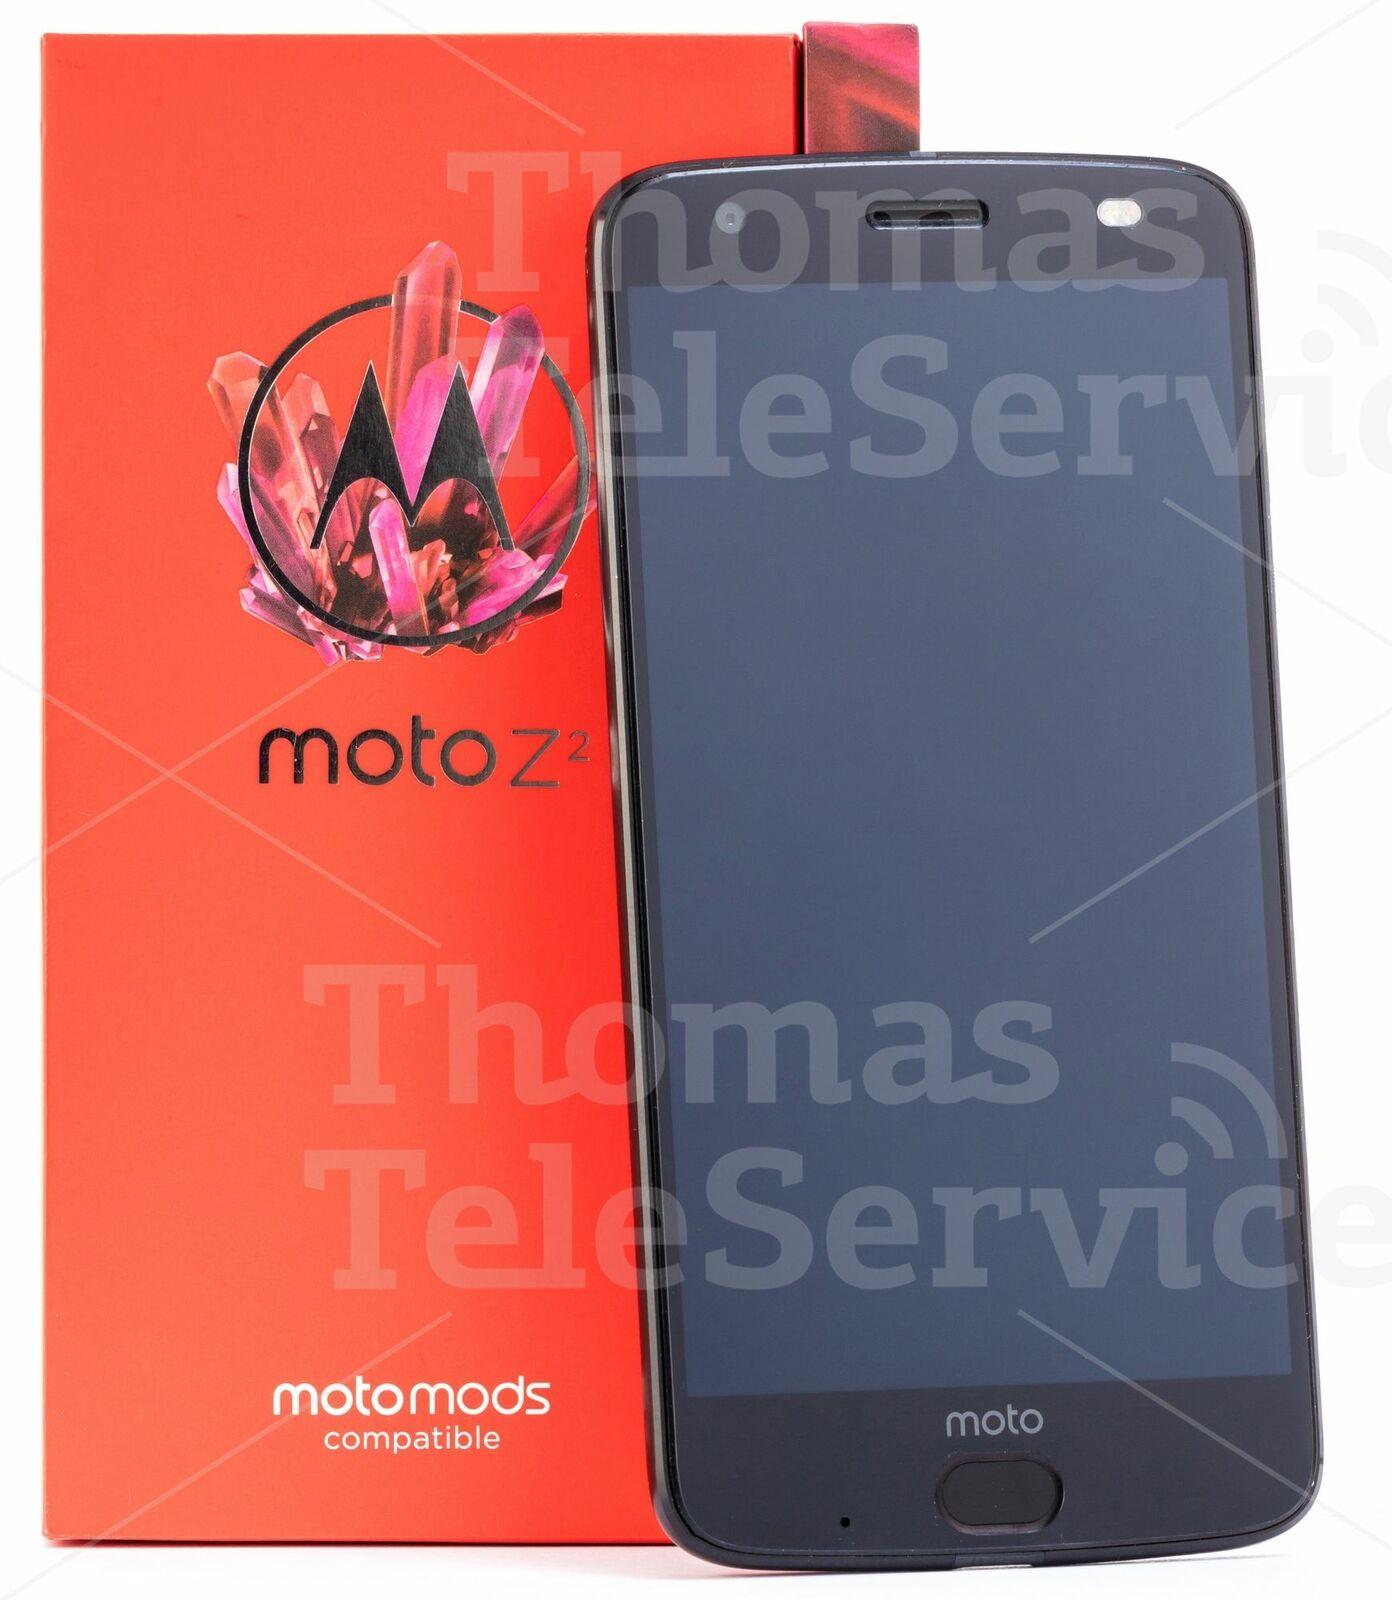 Motorola Moto Z2 Force Smartphone Handy Android Dual-Kamera Black Schwarz